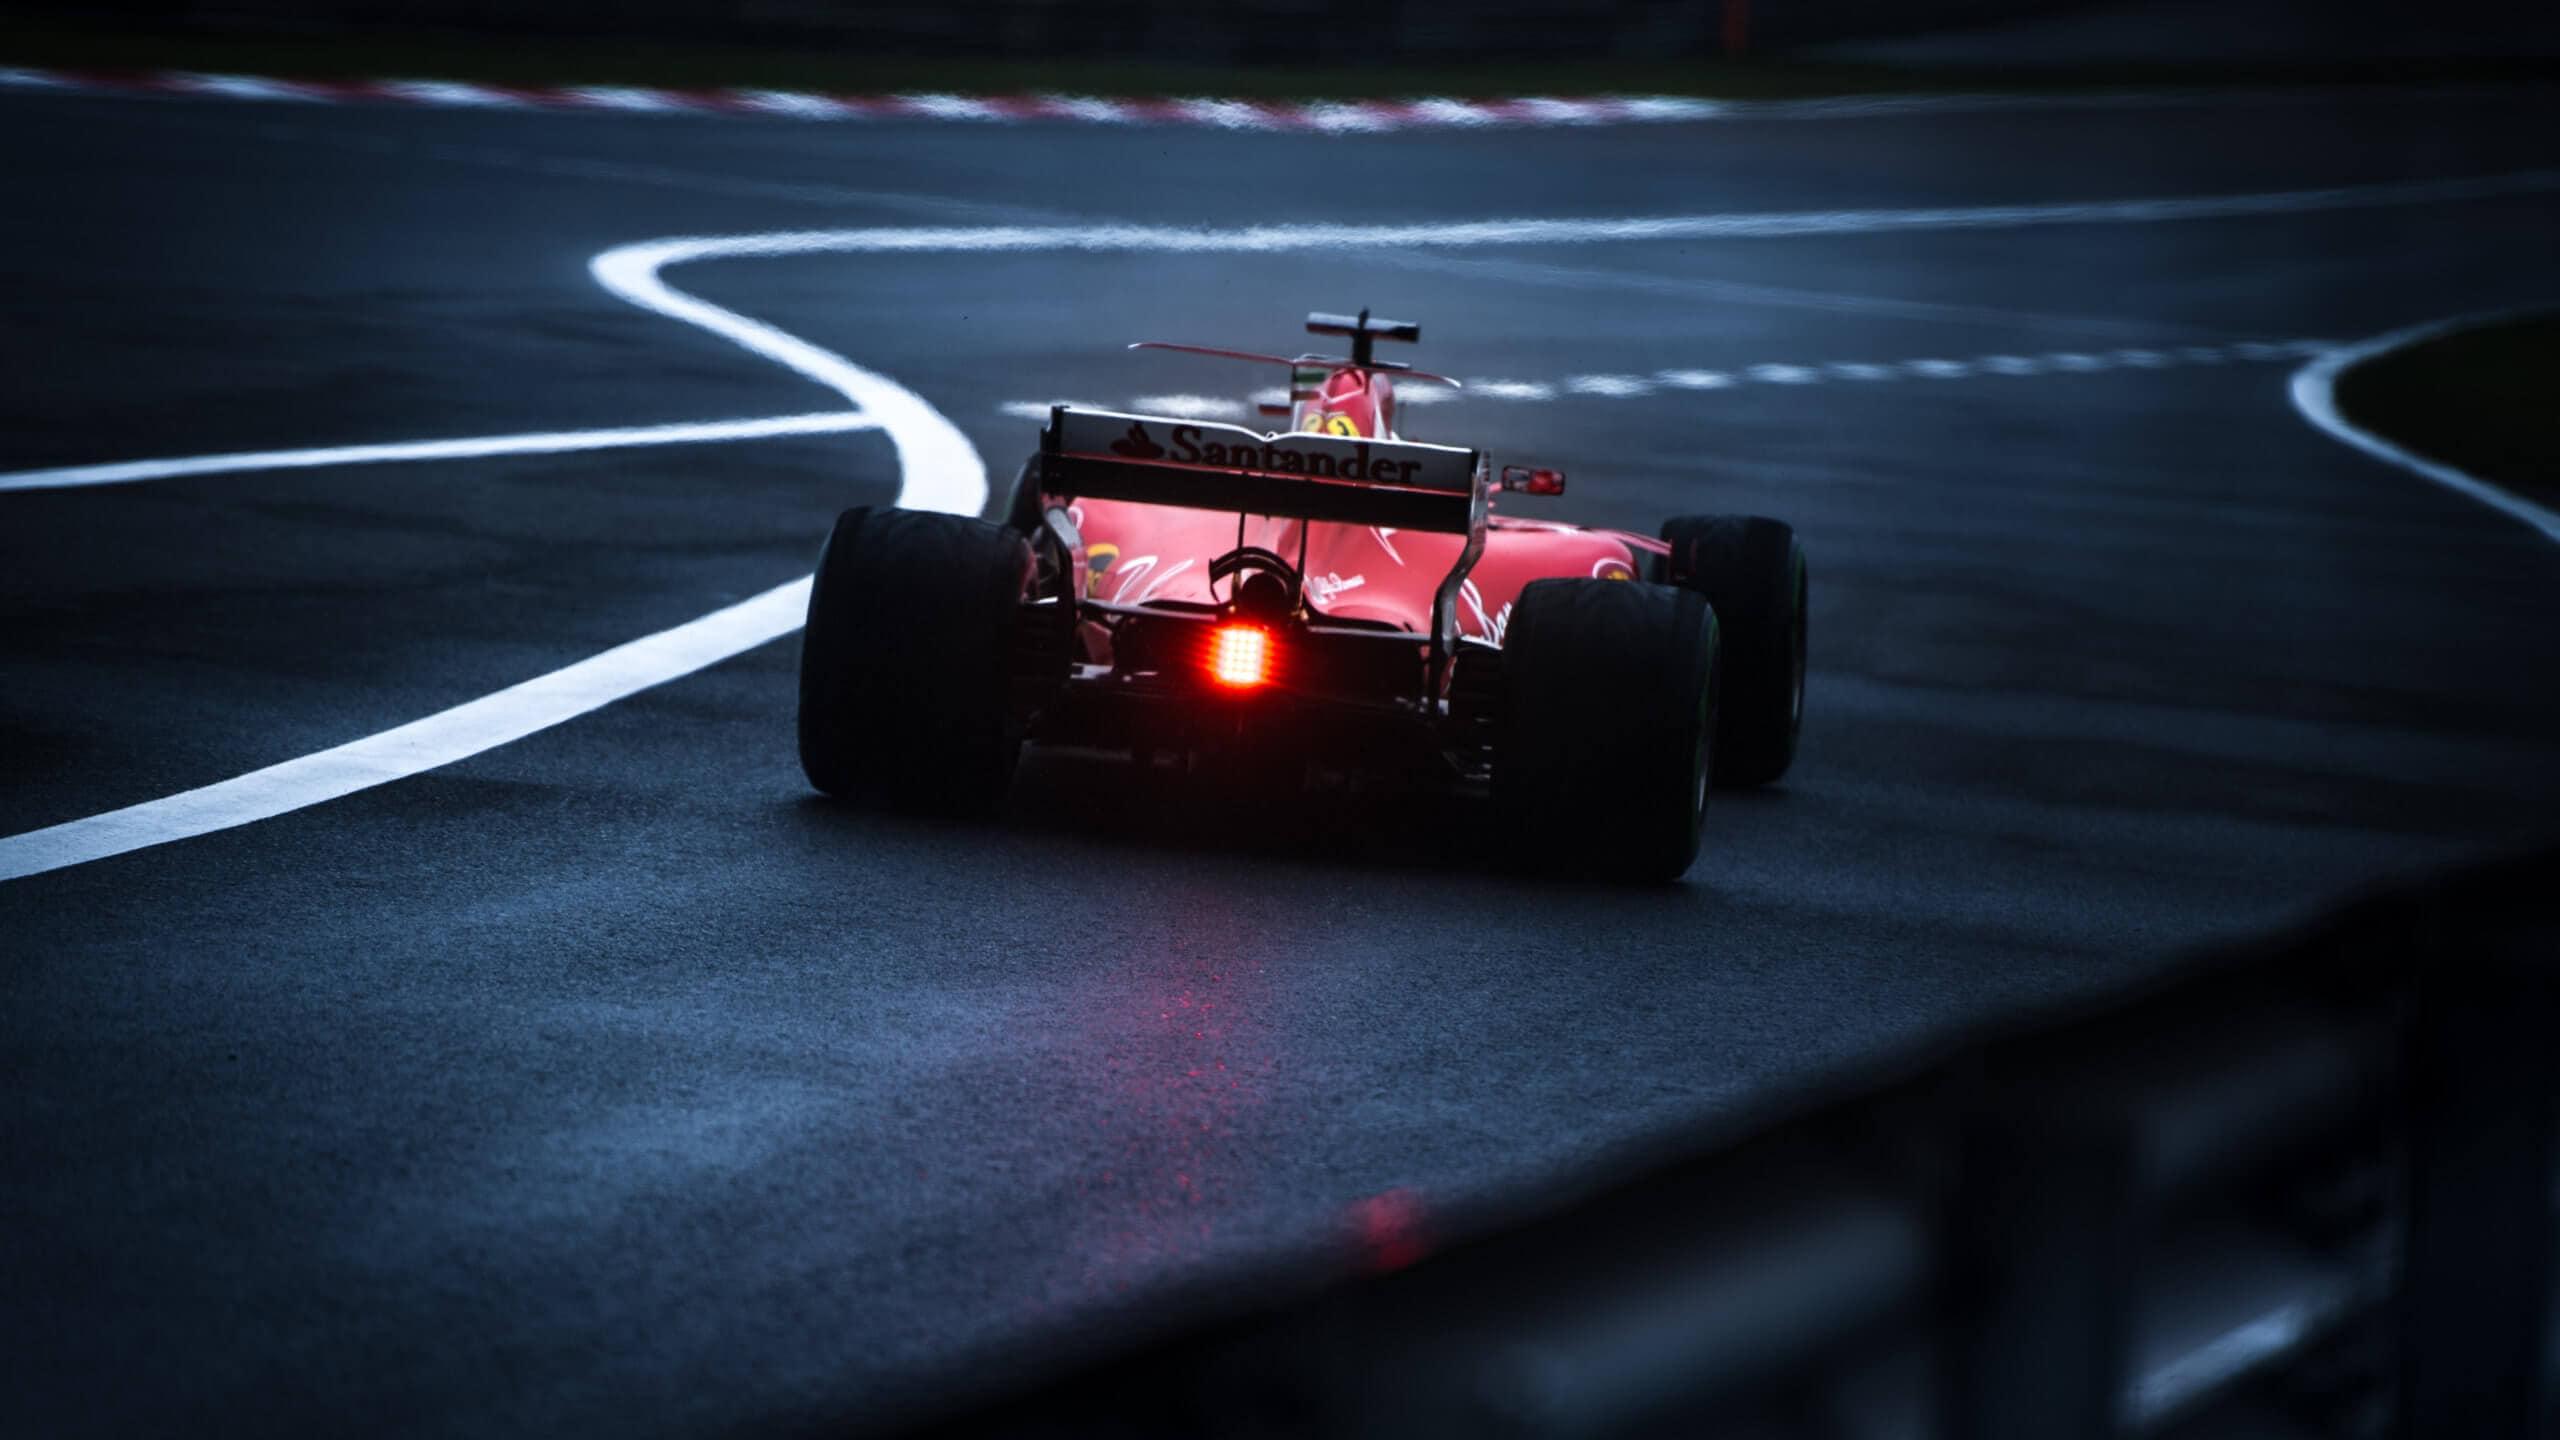 Formel 1 - Formel-1-Auto